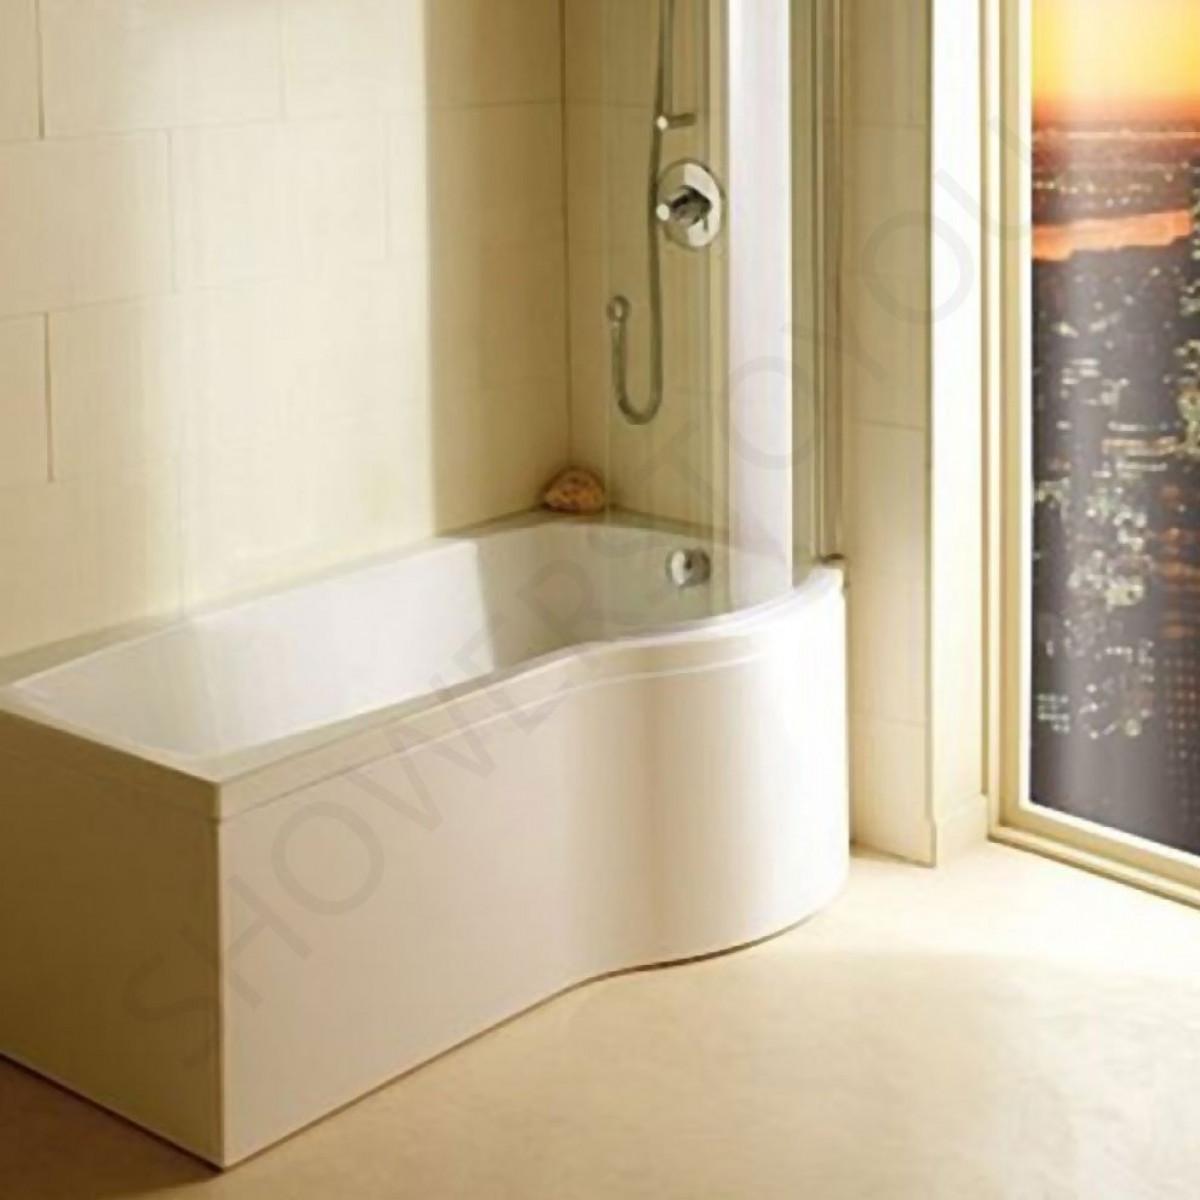 carron delta 1600x700 800mm shower bath bathroom faucets showers toilets and accessories delta